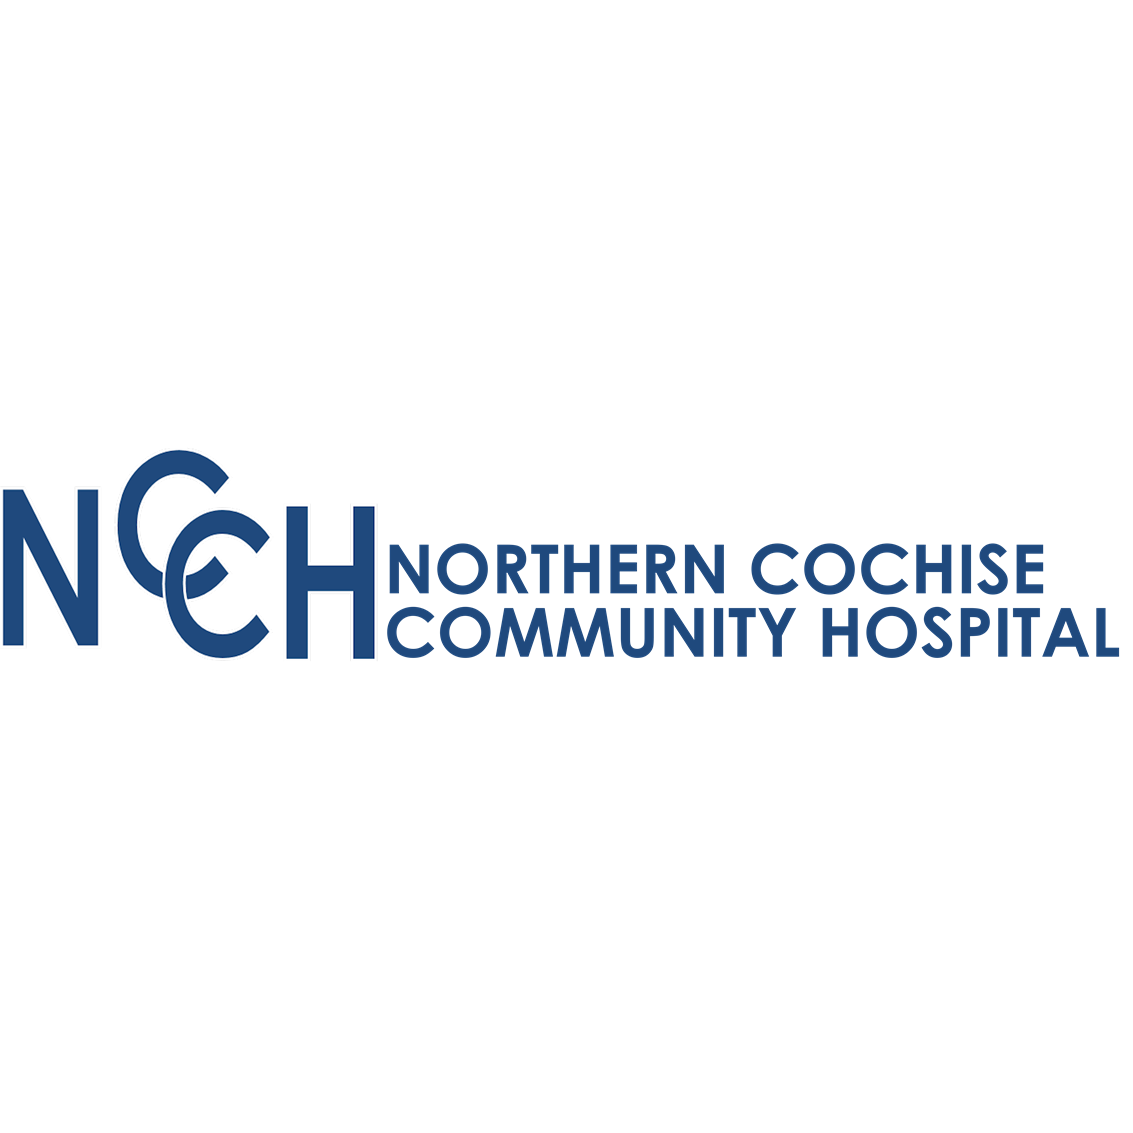 Northern Cochise Community Hospital